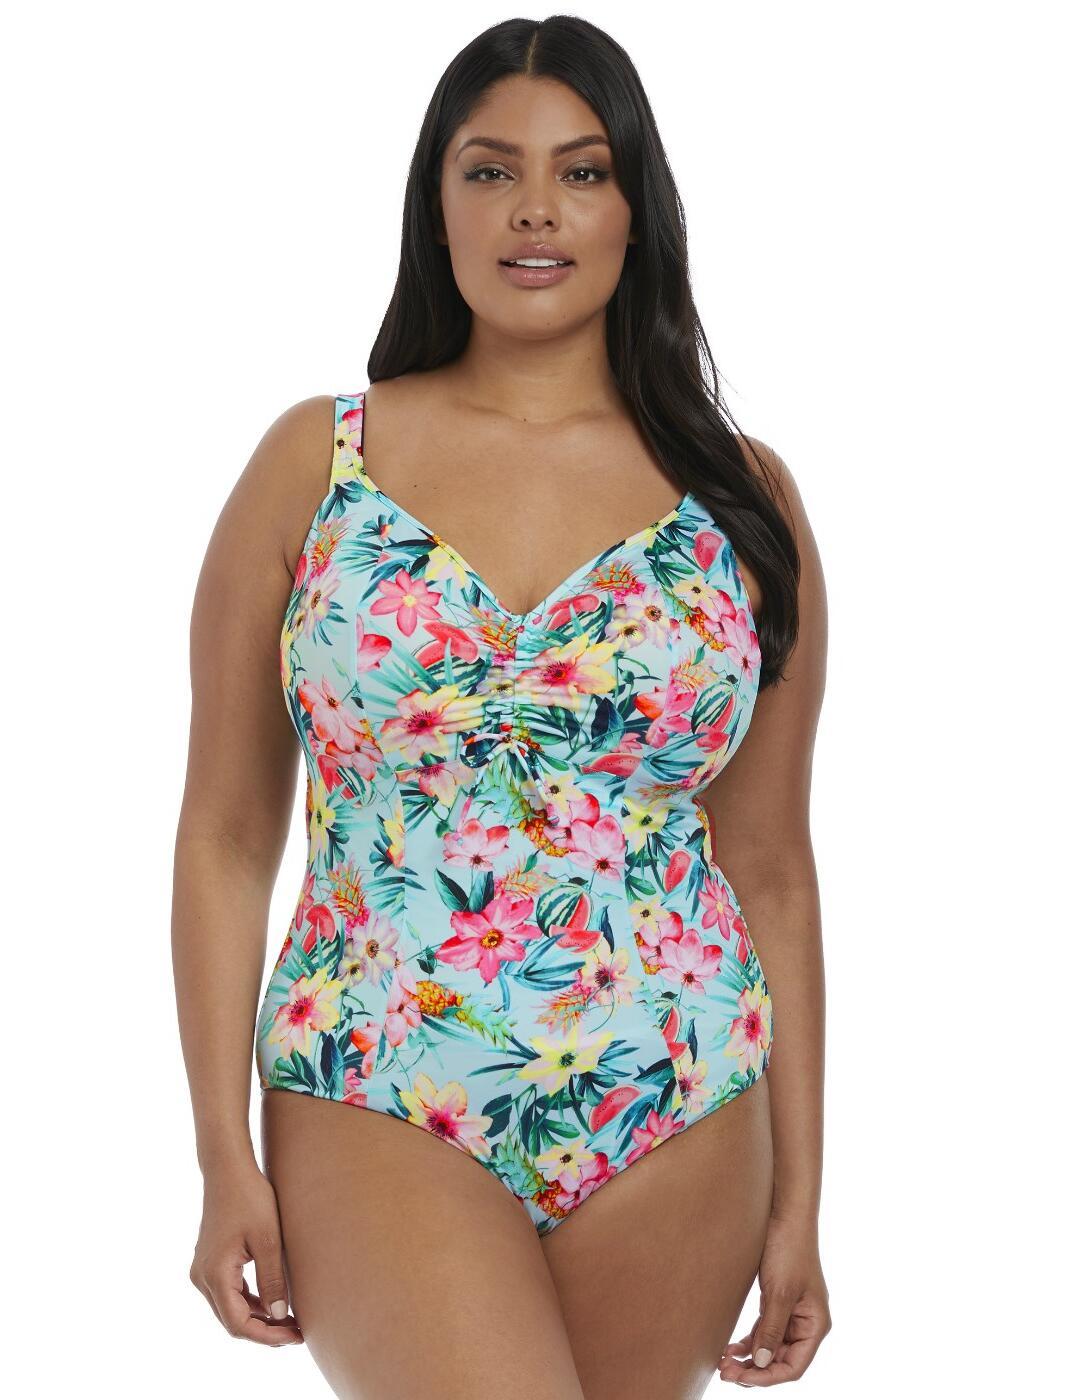 7150 Elomi Aloha Moulded Adjustable Neckline Swimsuit - 7150 Aqua